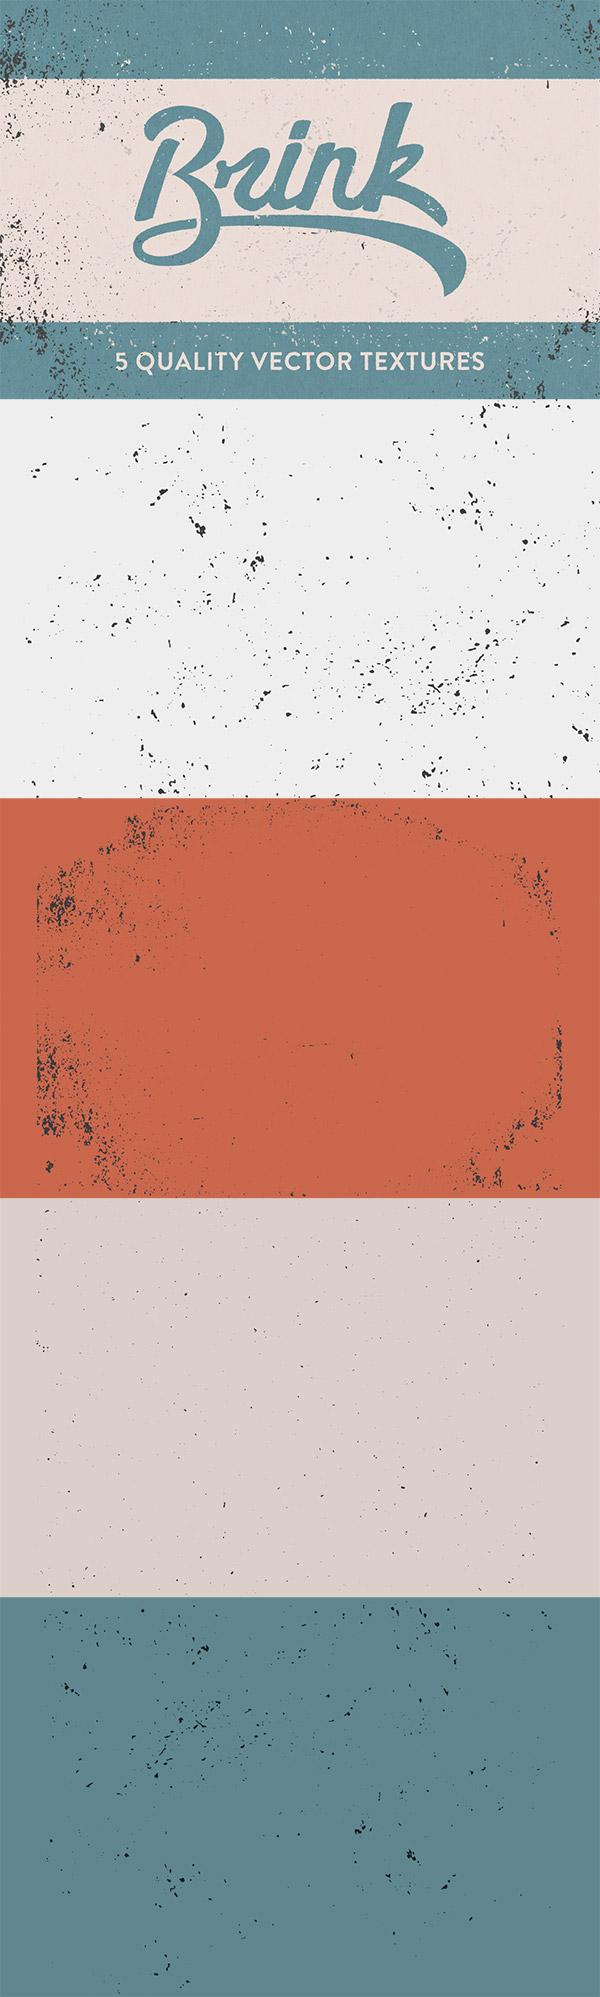 Brink Design Co. Vector Textures